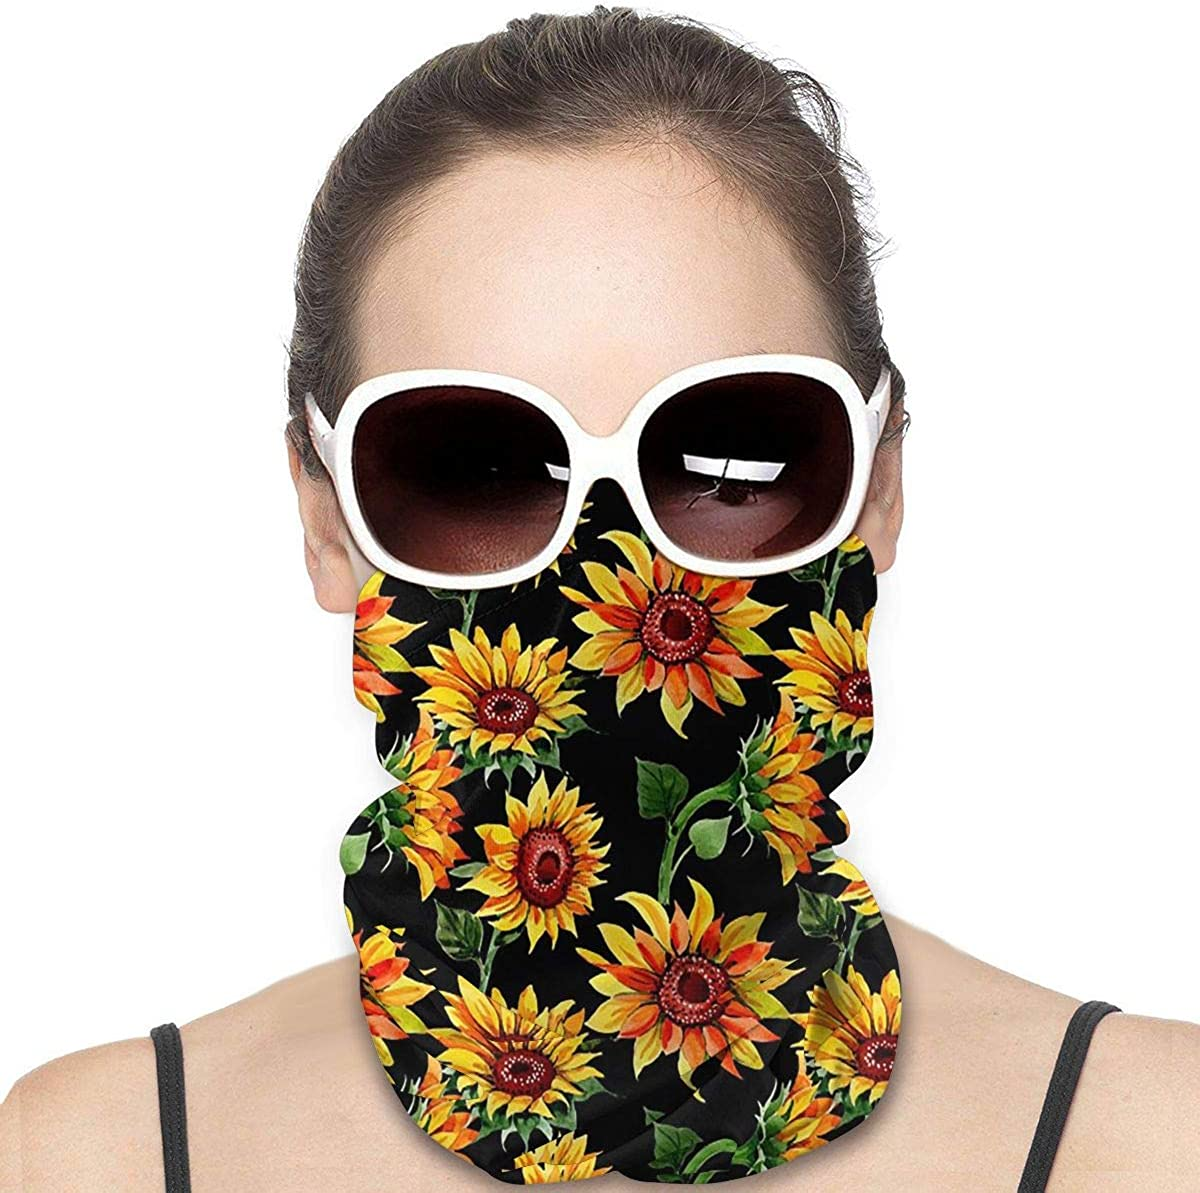 KiuLoam Women Bandanas Face Mask, Sunflower Floral Neck Gaiter Mask Headband for Men Face Scarf Dust, Outdoors, Sports